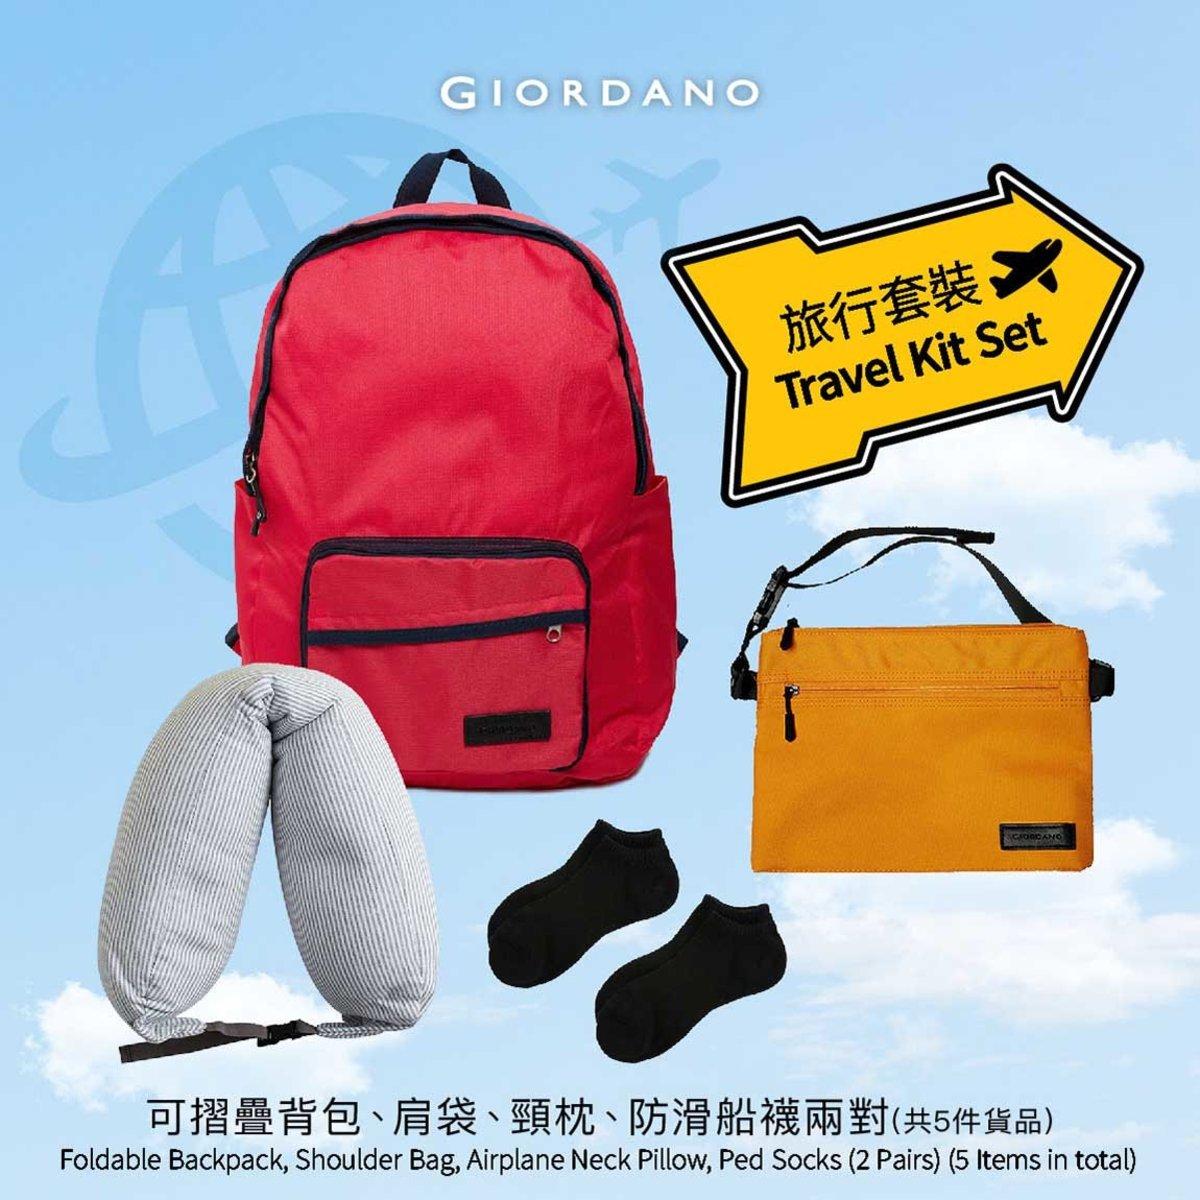 Travel Kit Set